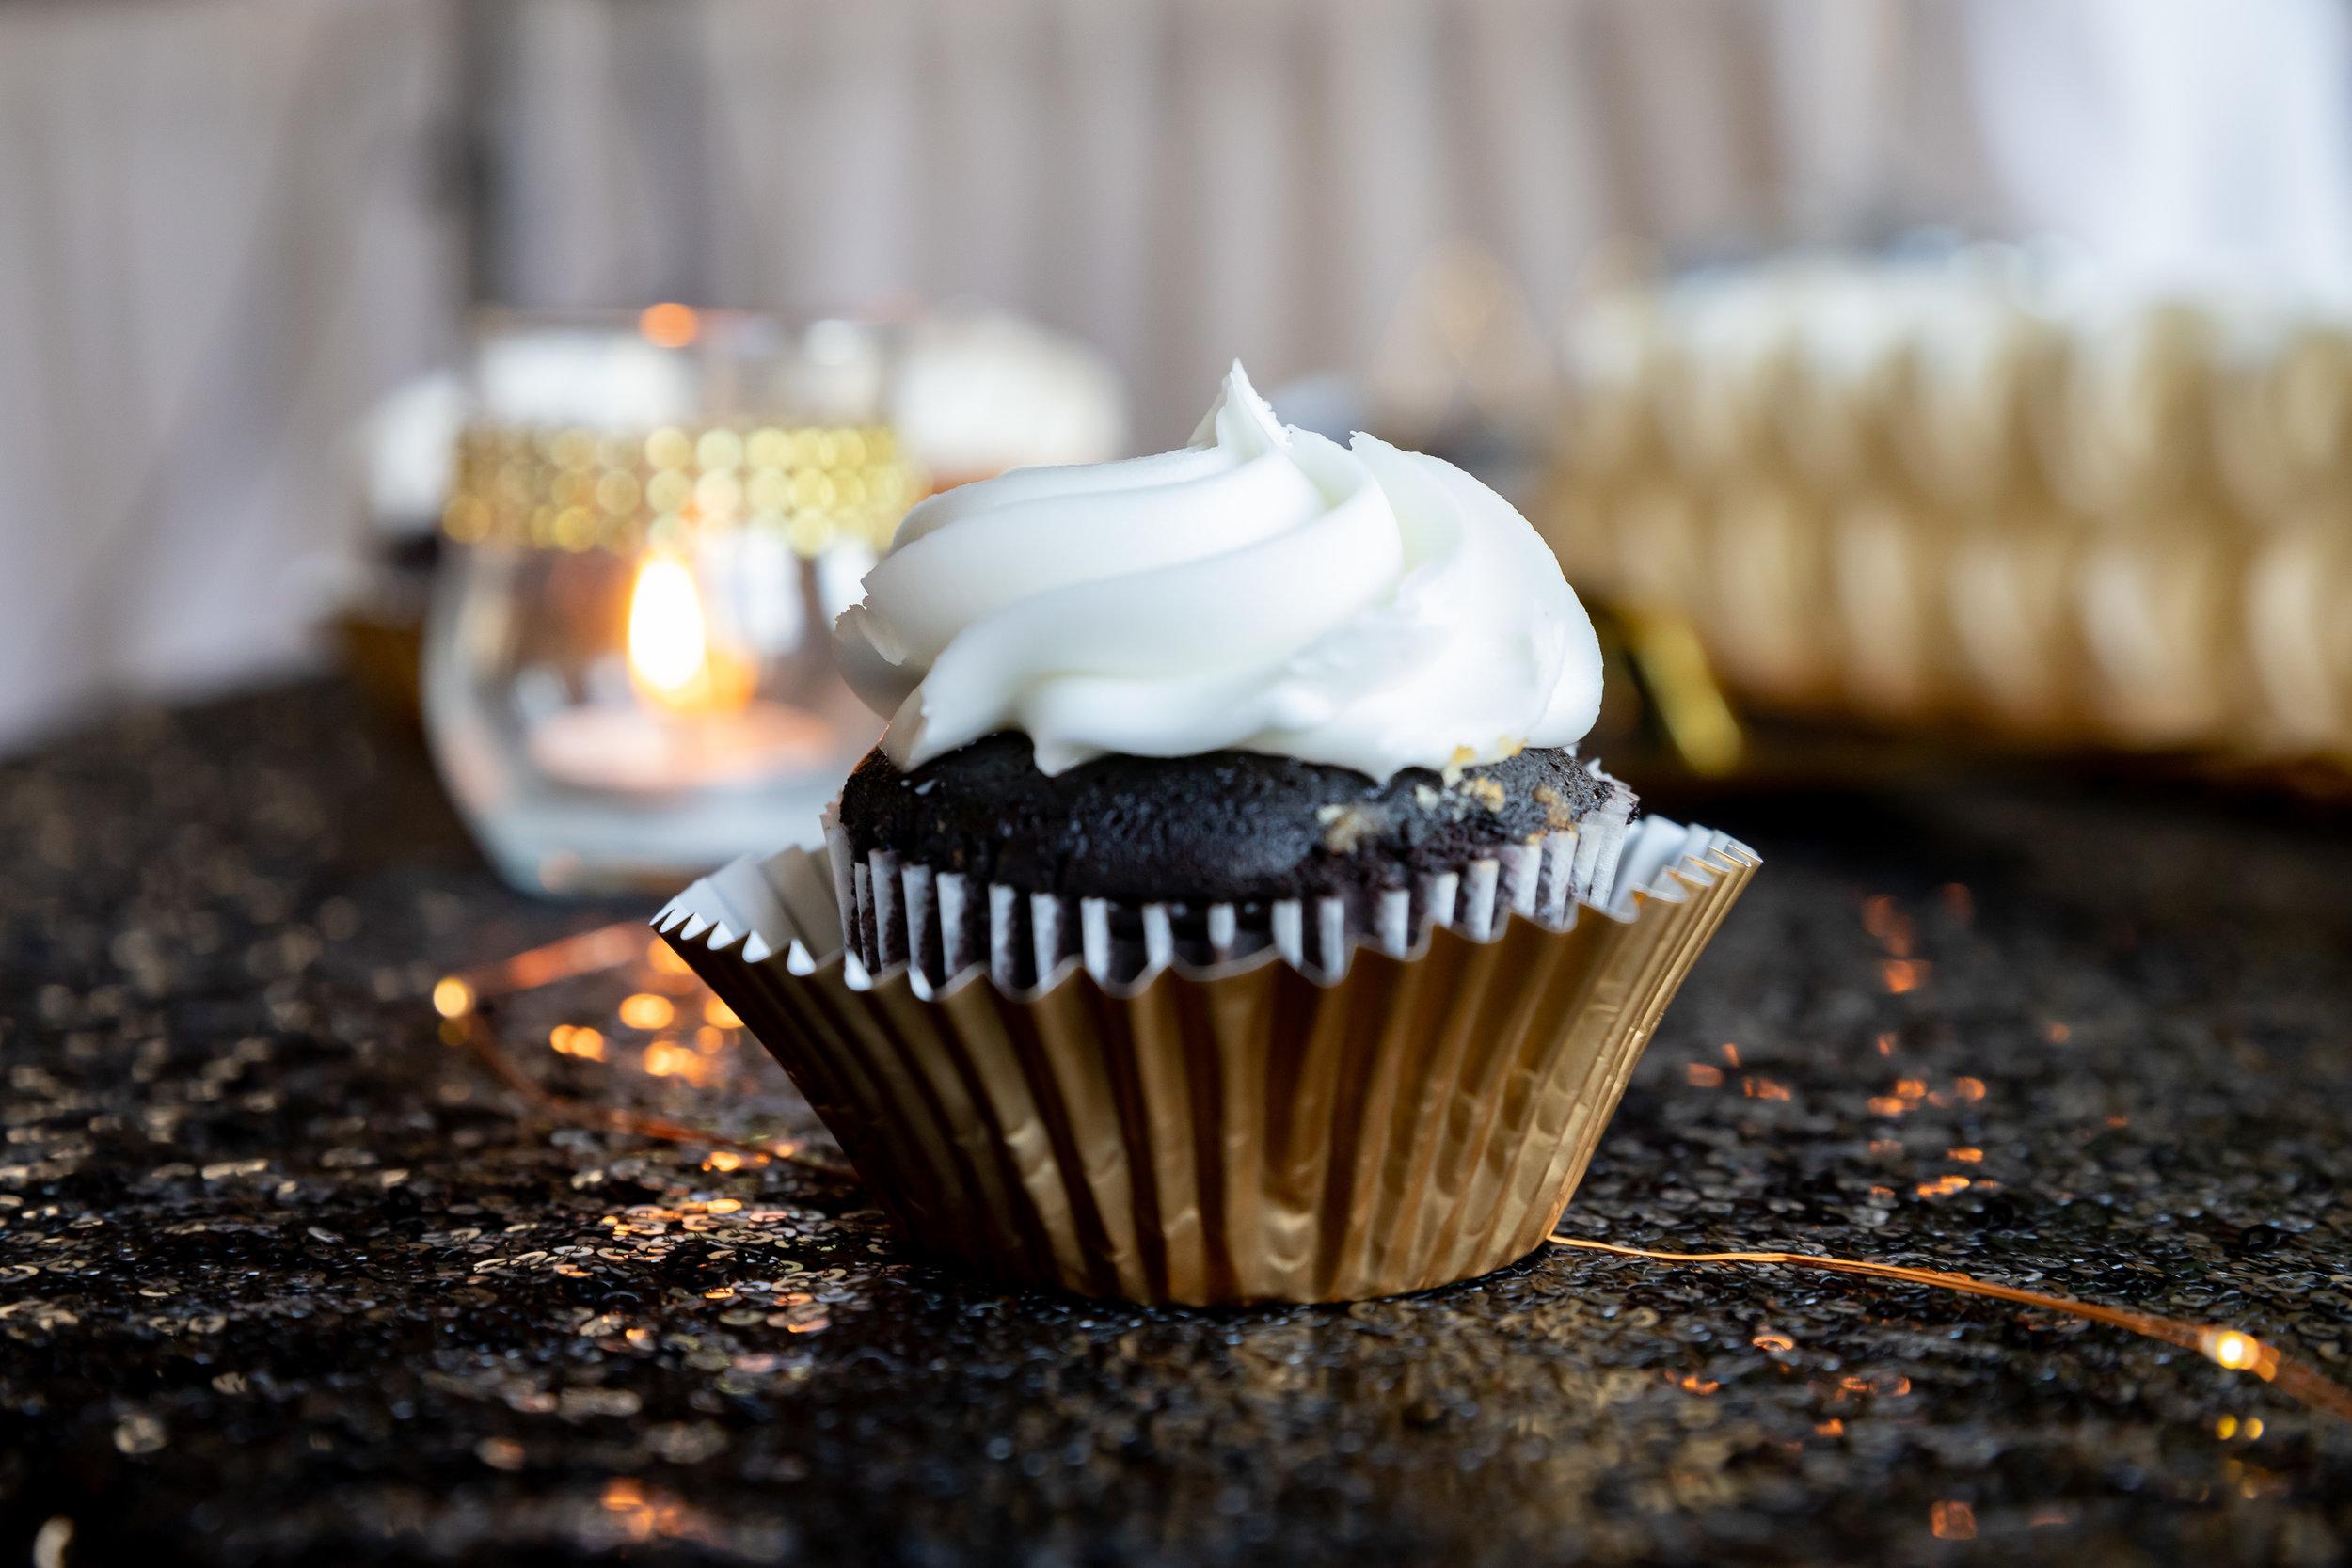 cupcake IMG_2903